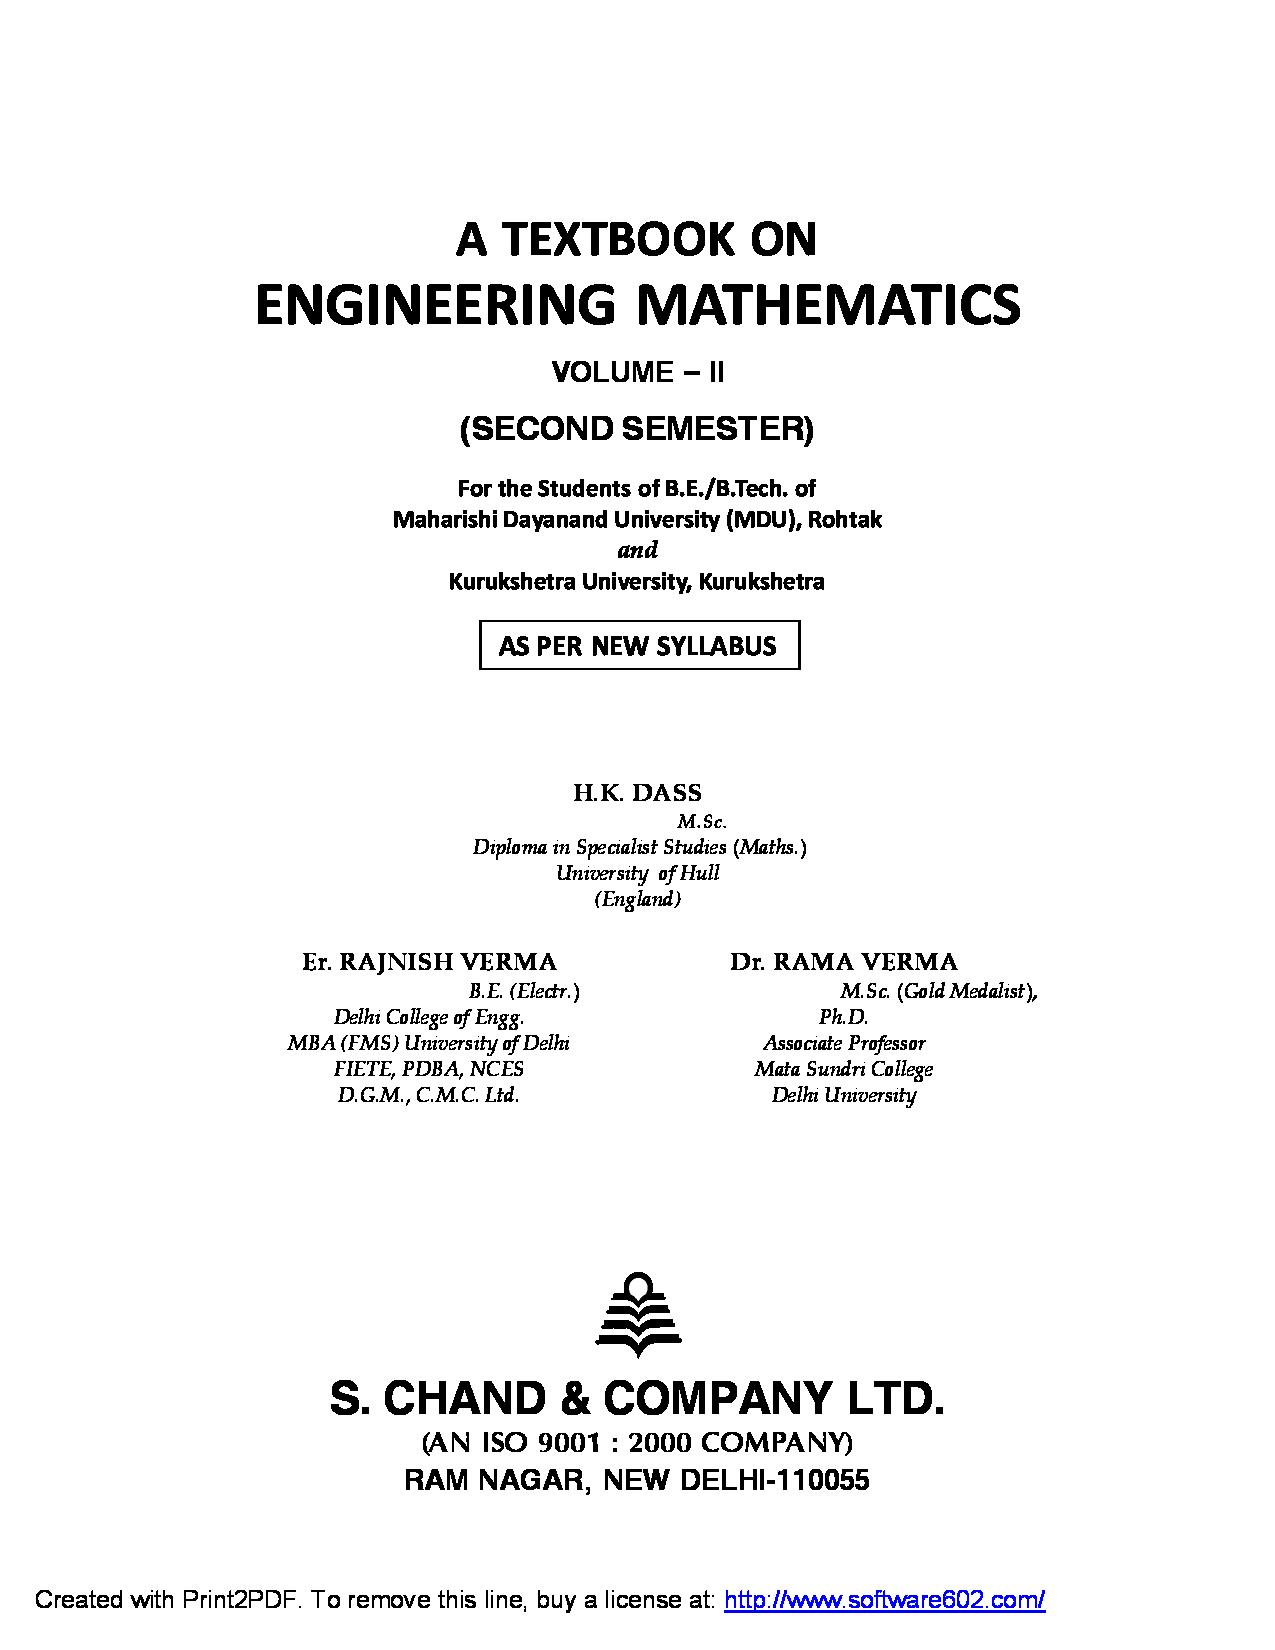 Engineering Mathematics 2 - Apps on Google Play